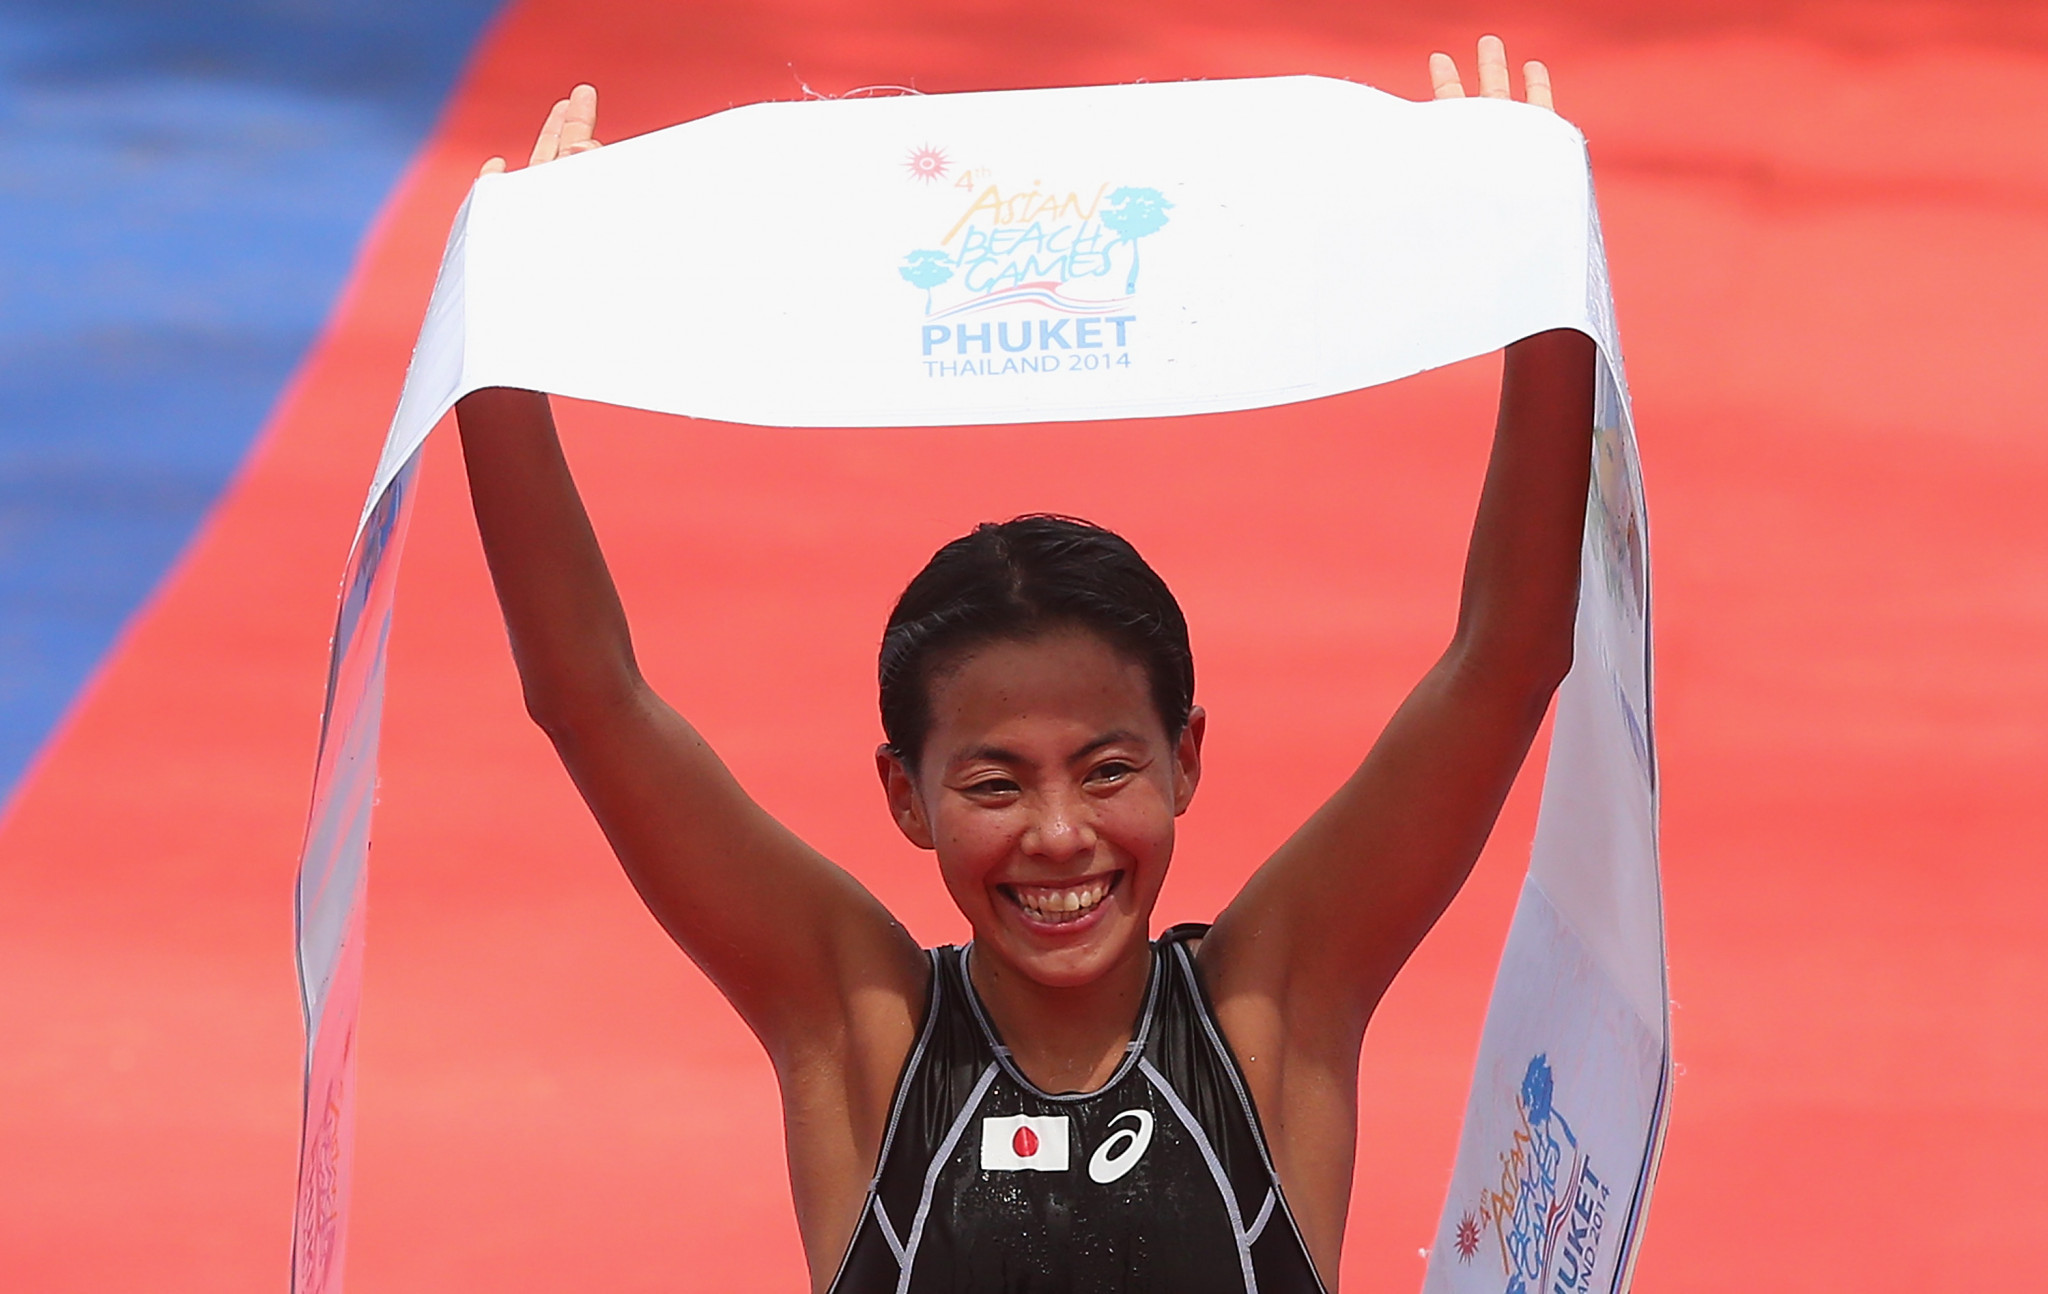 Ueda joins ITU Executive Board as athlete representative